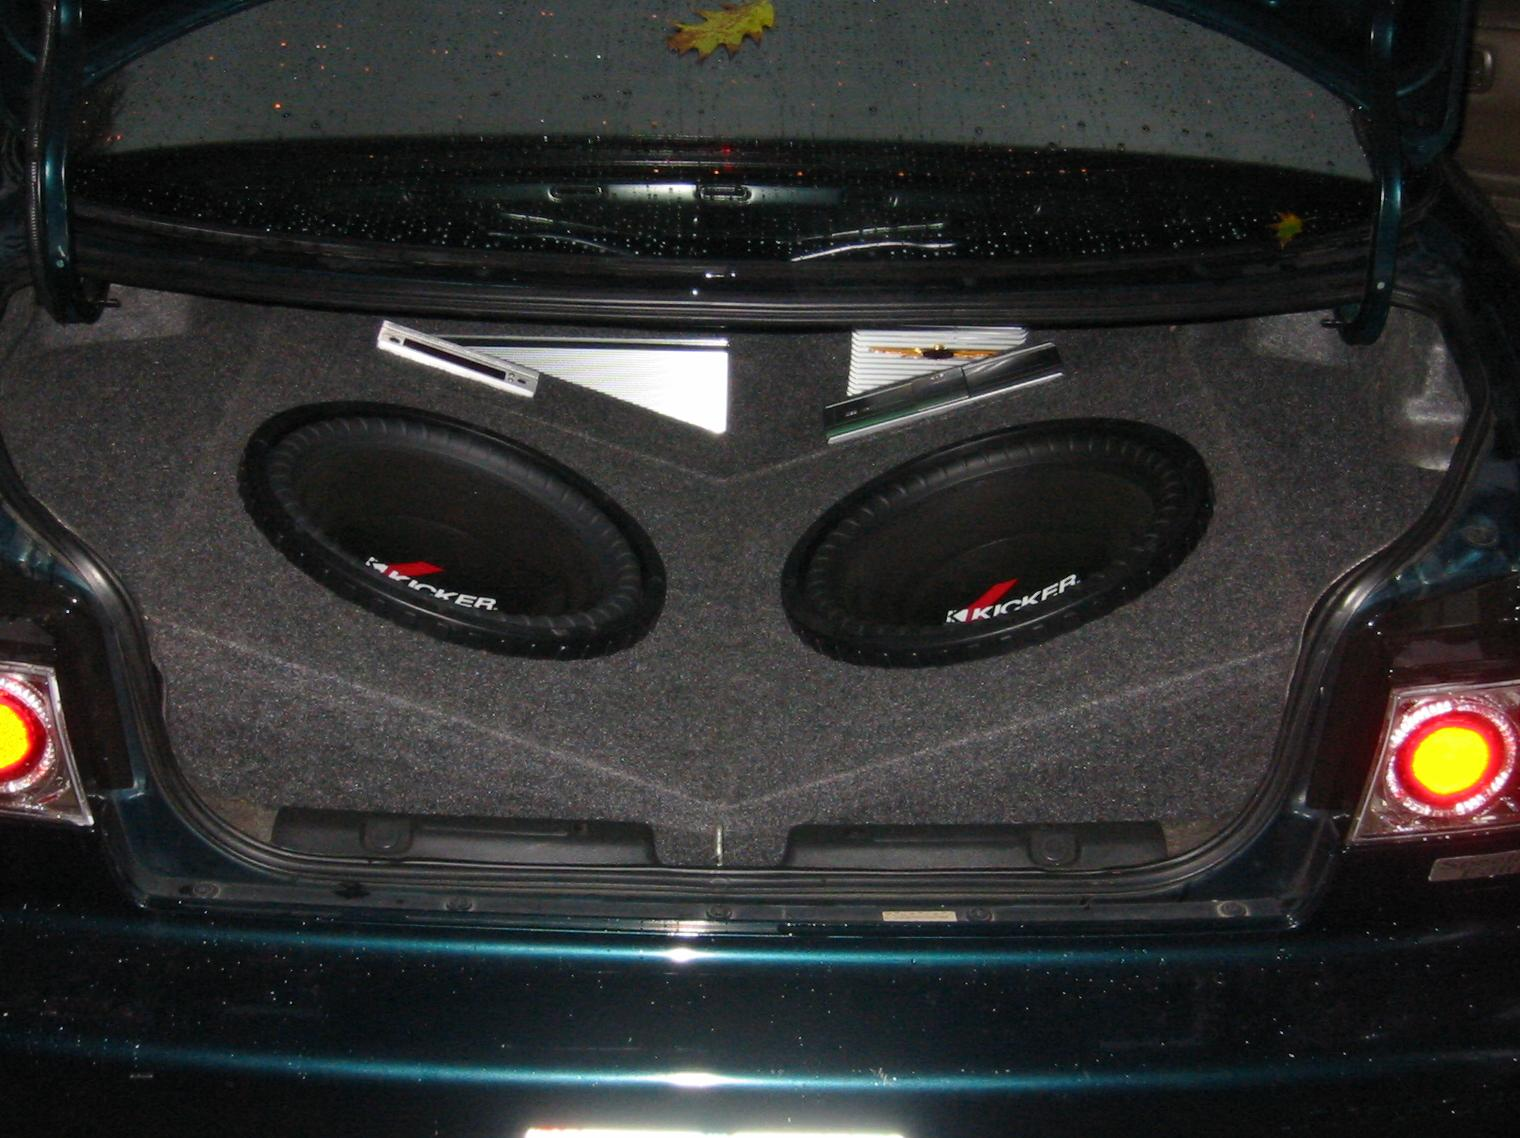 computer masala car stereo systems. Black Bedroom Furniture Sets. Home Design Ideas